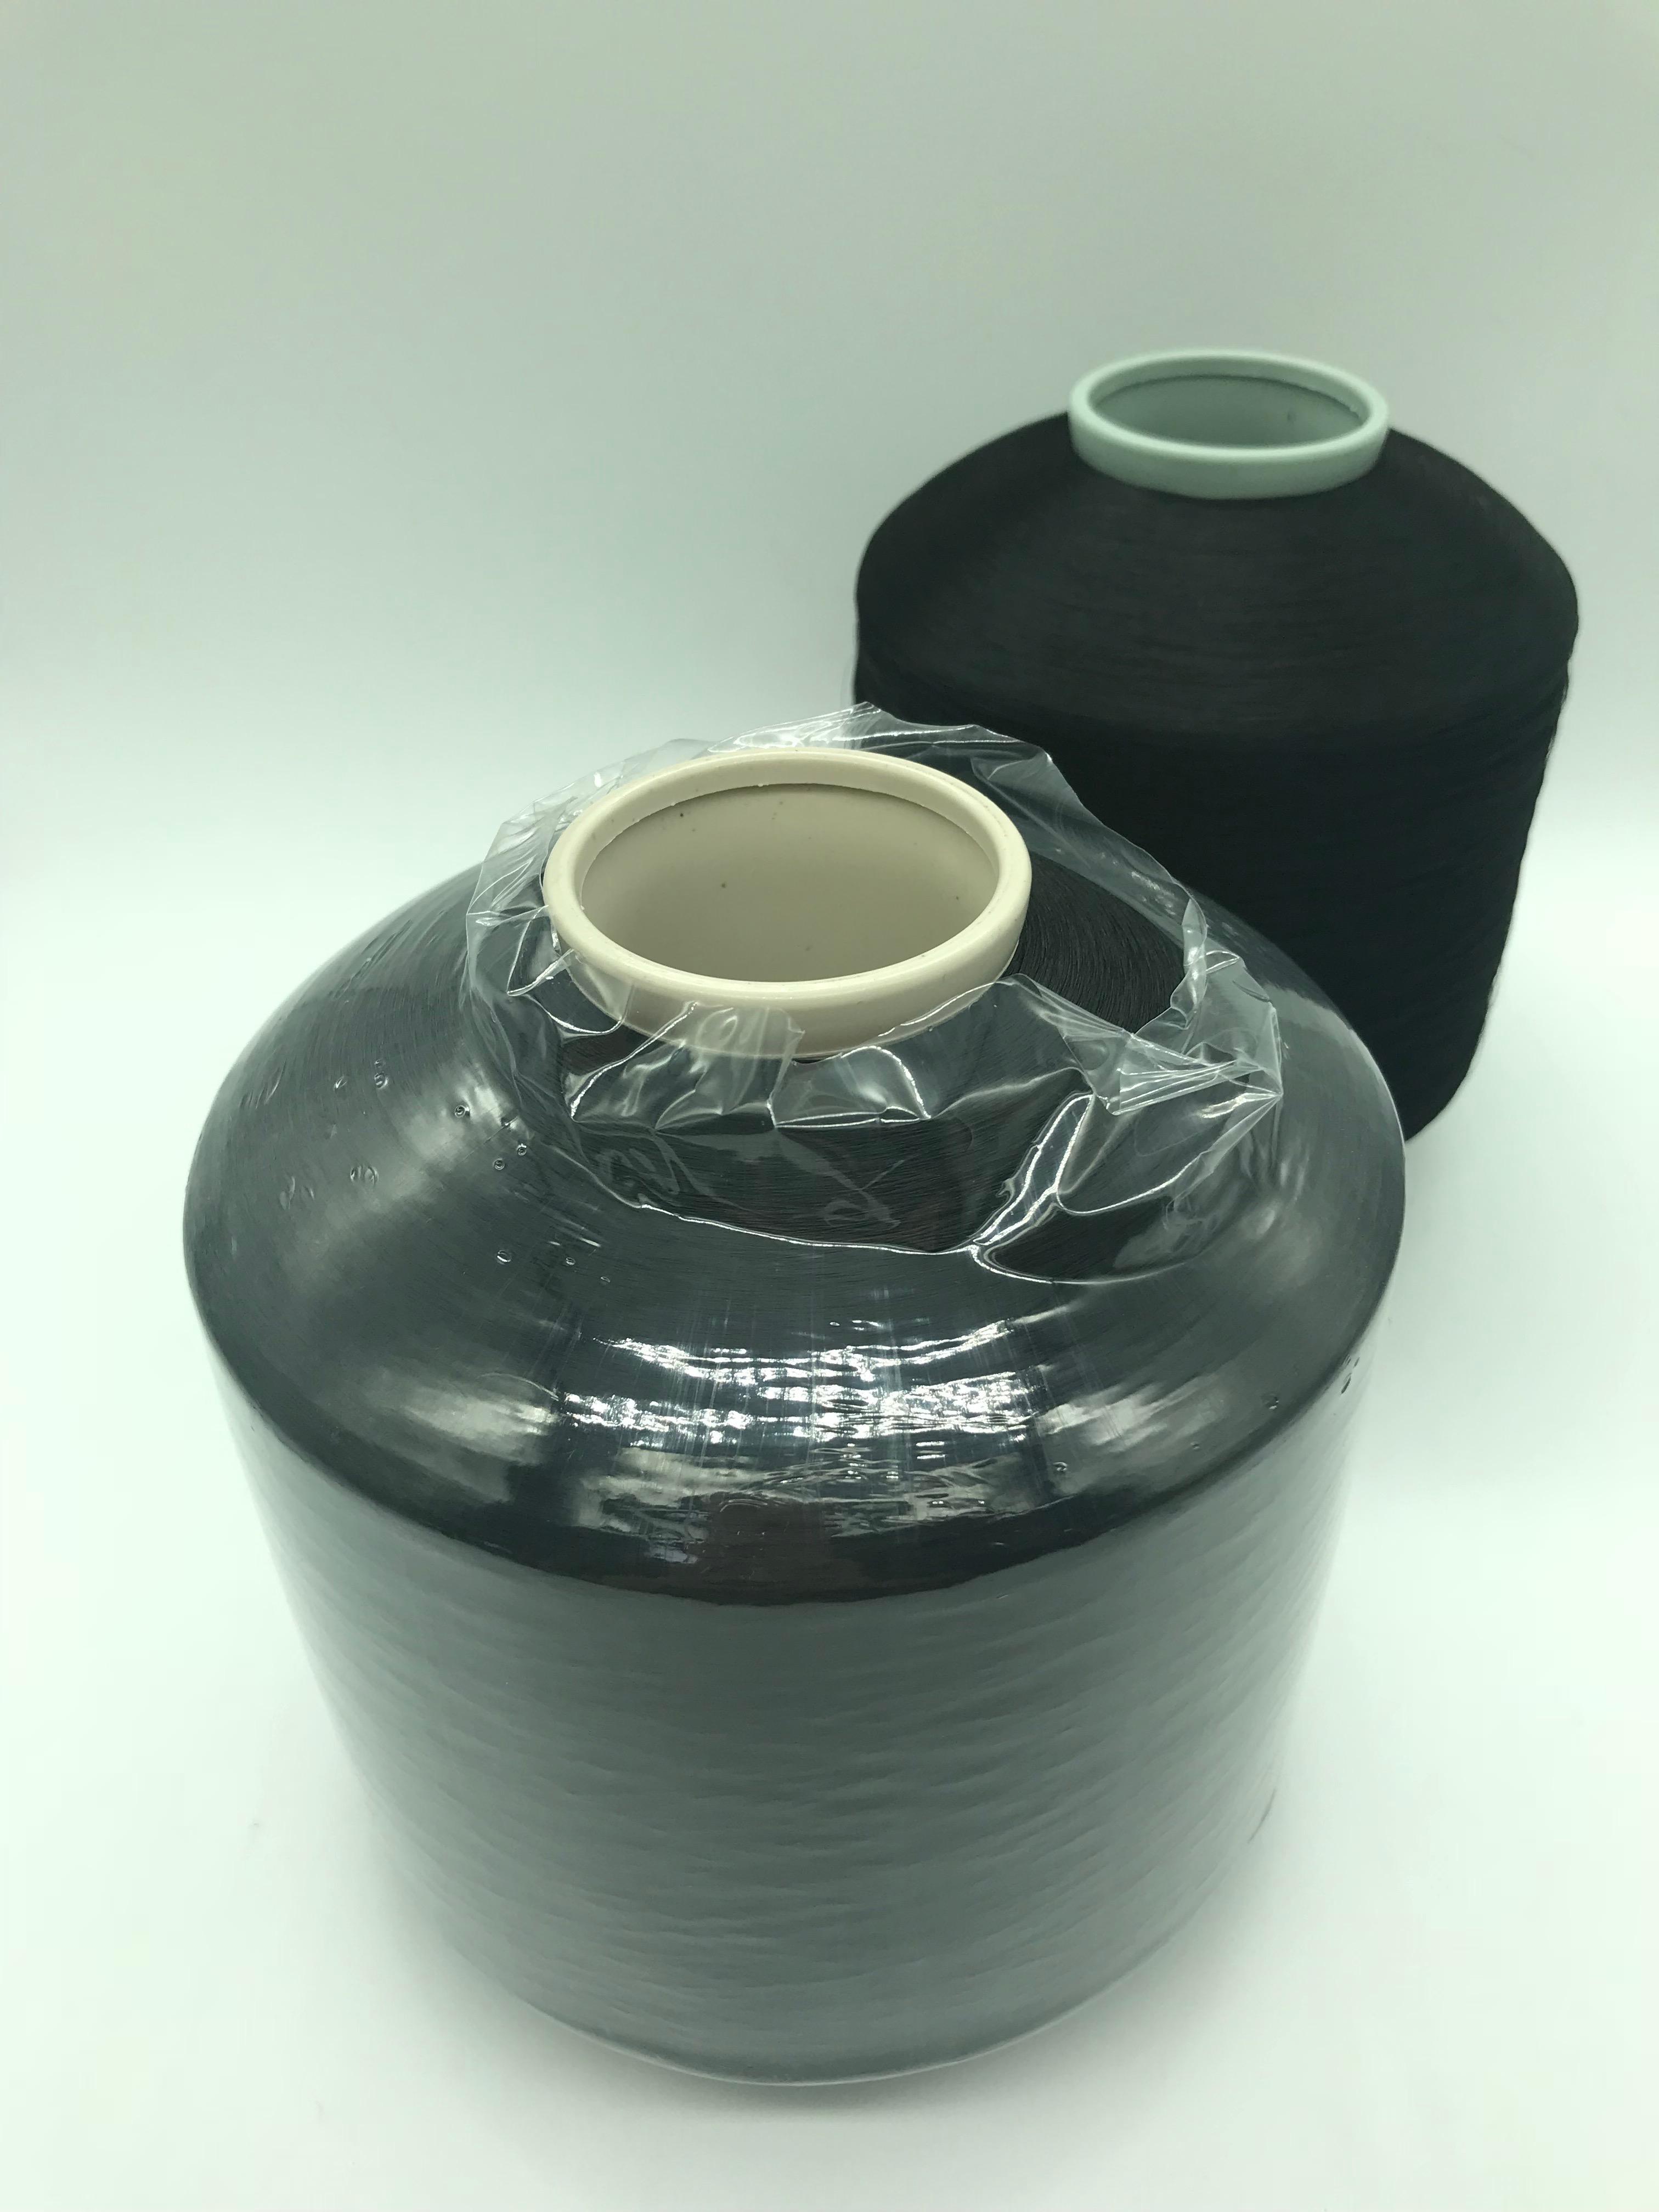 Embalaje y carga